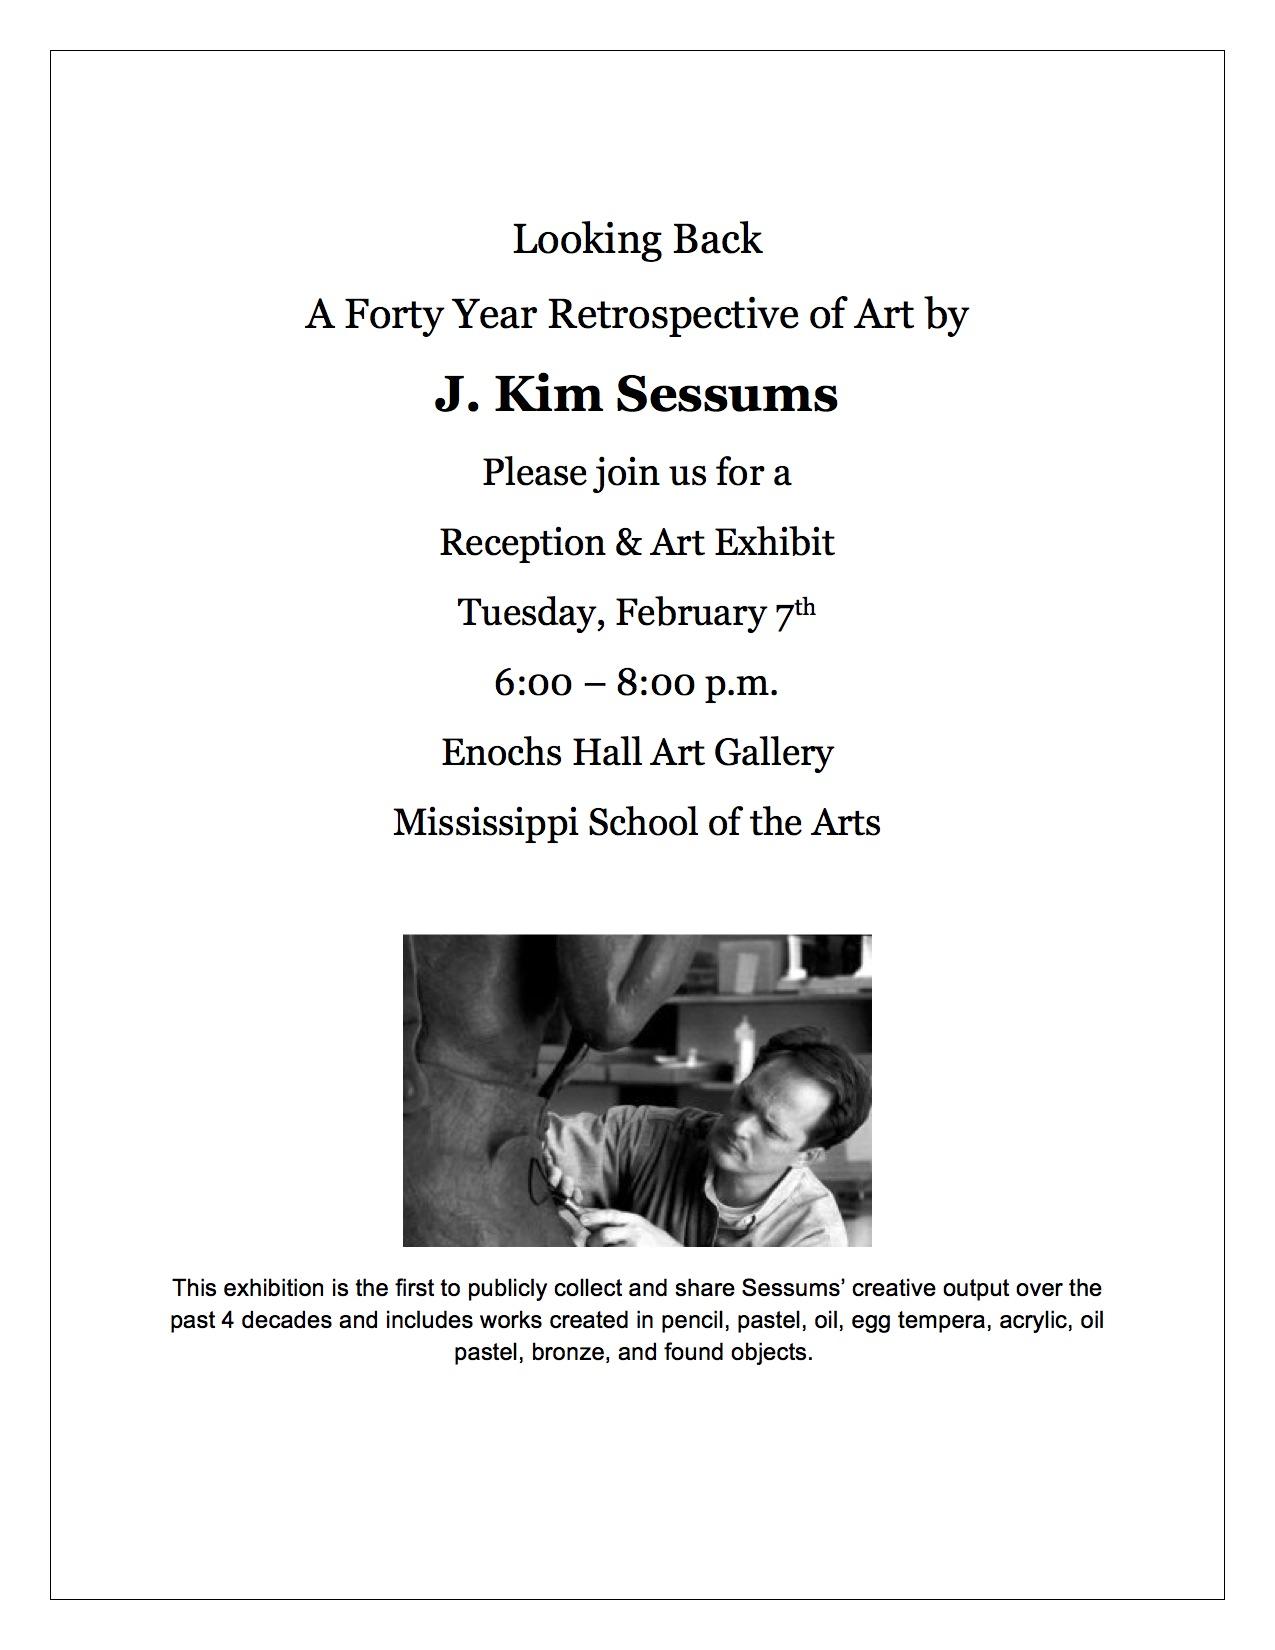 Sessums Invitation